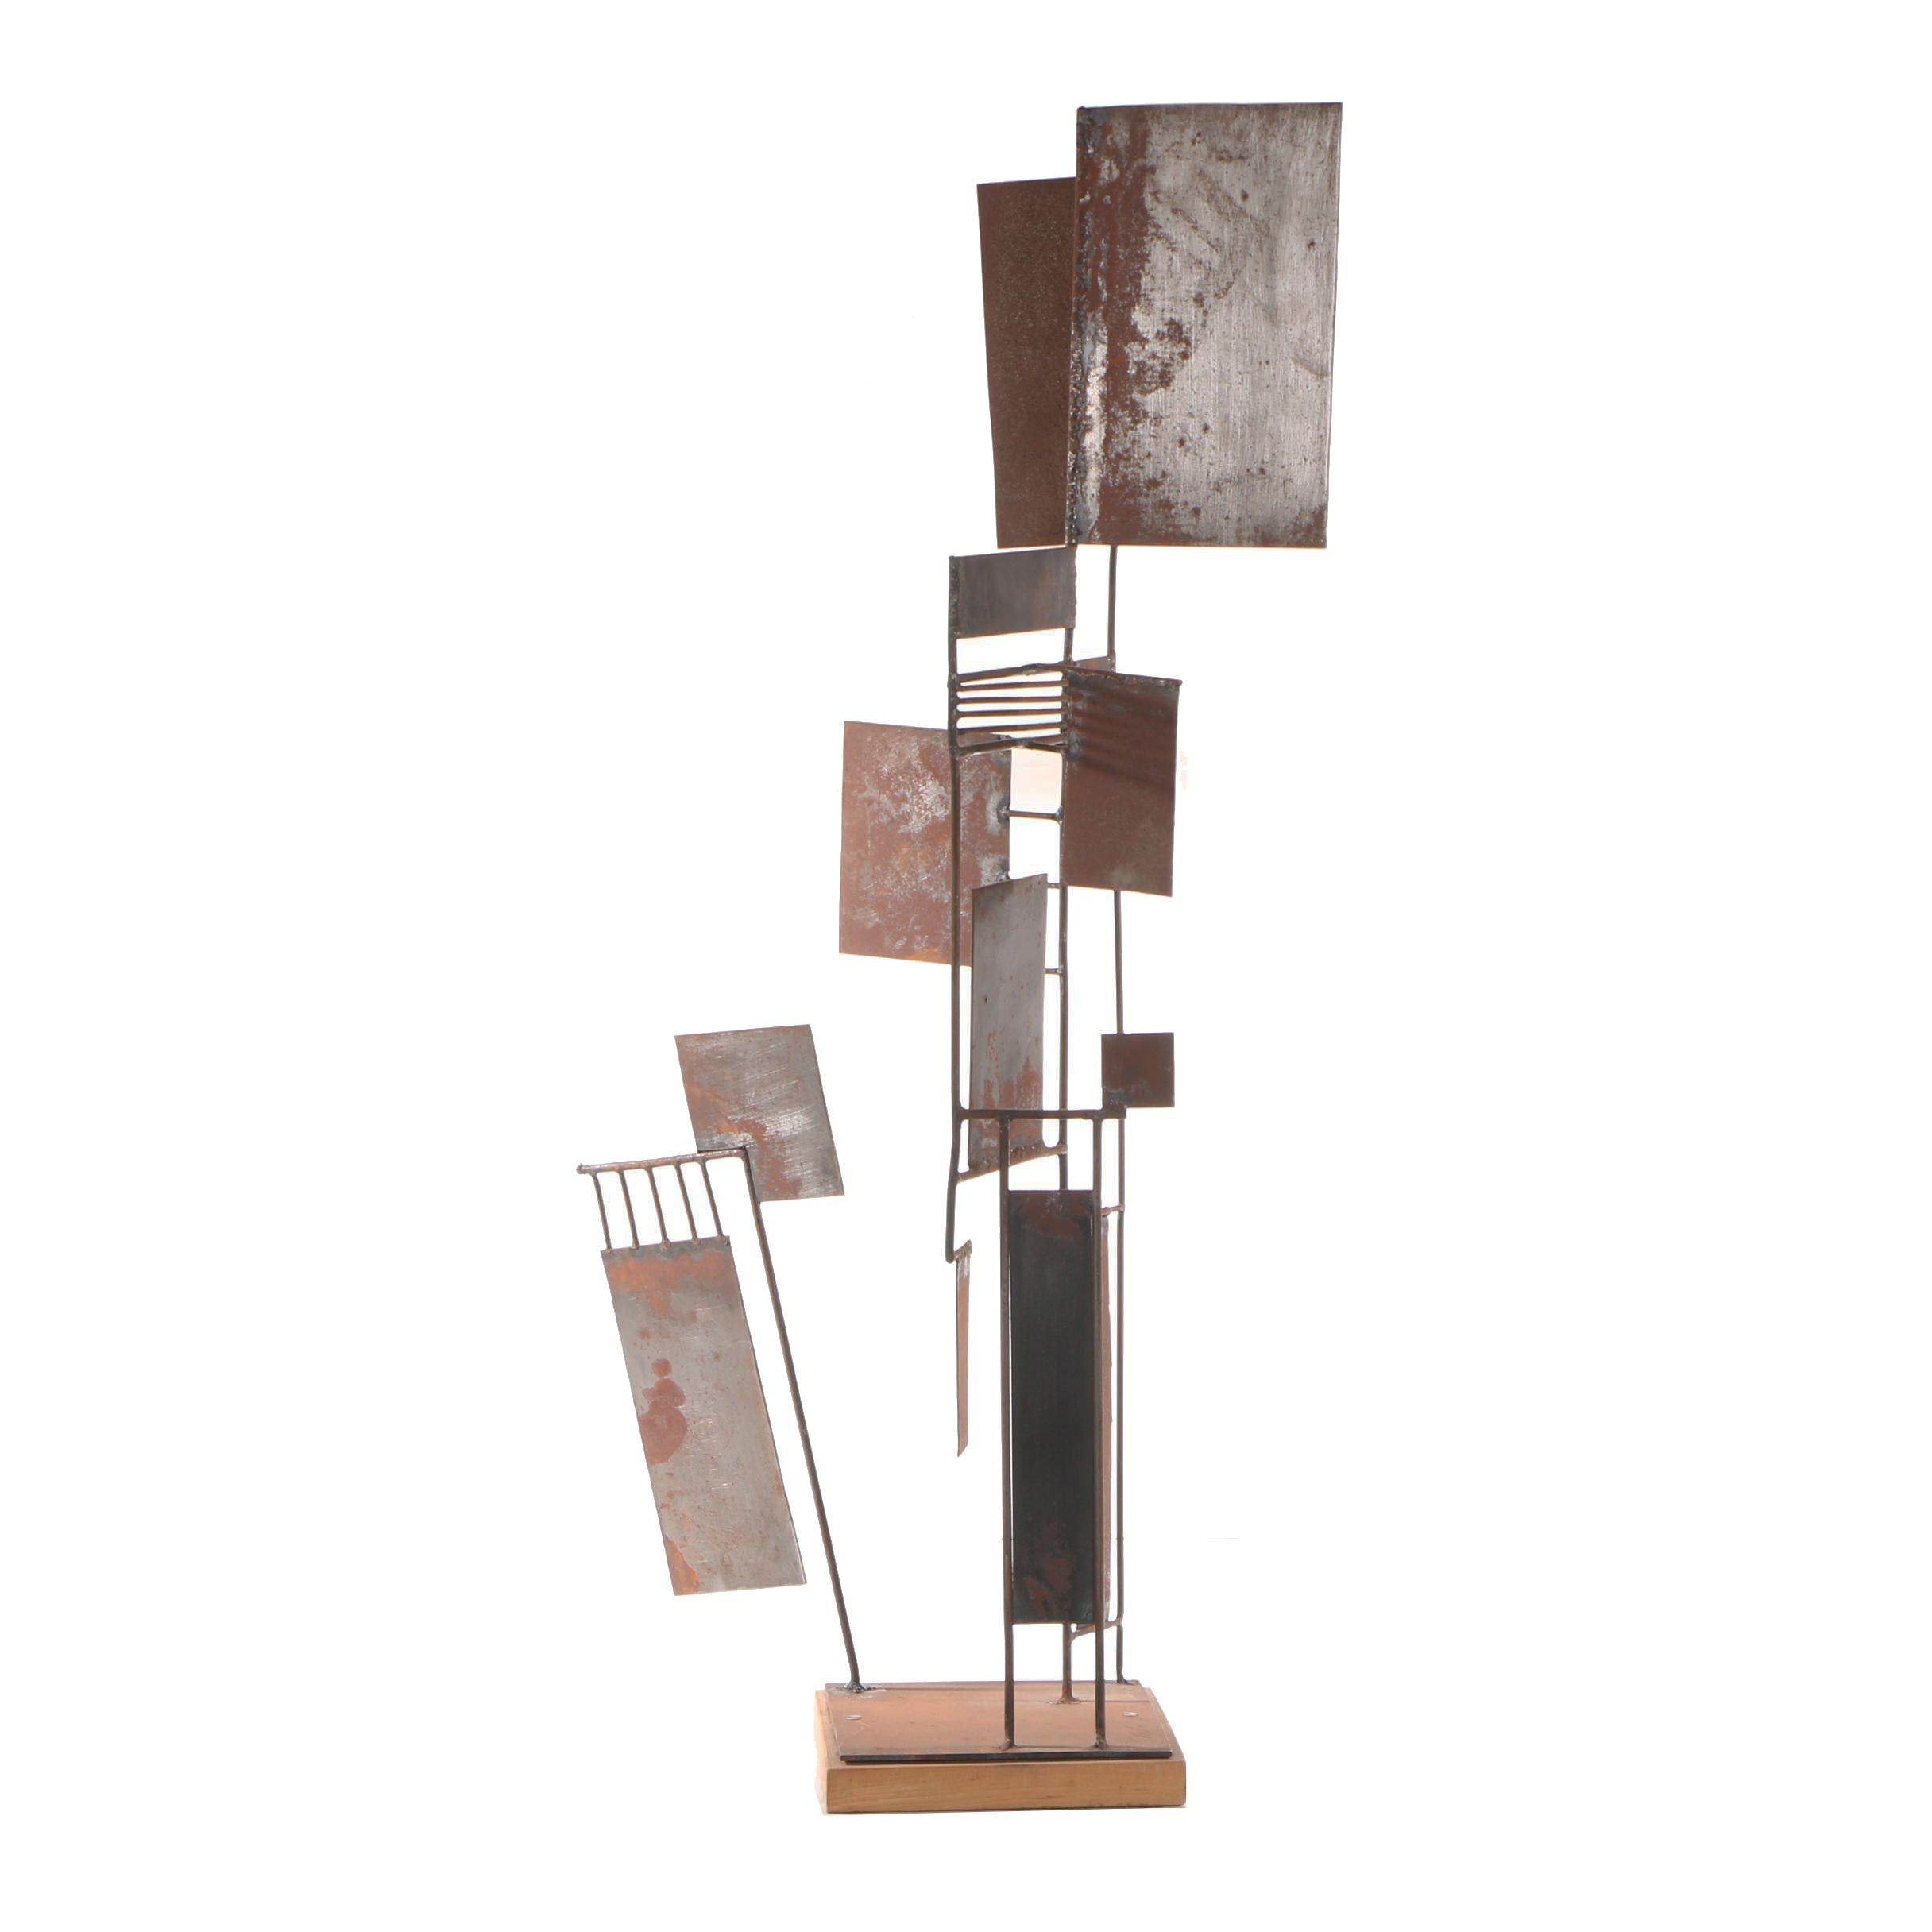 John Tuska Metal Sculpture